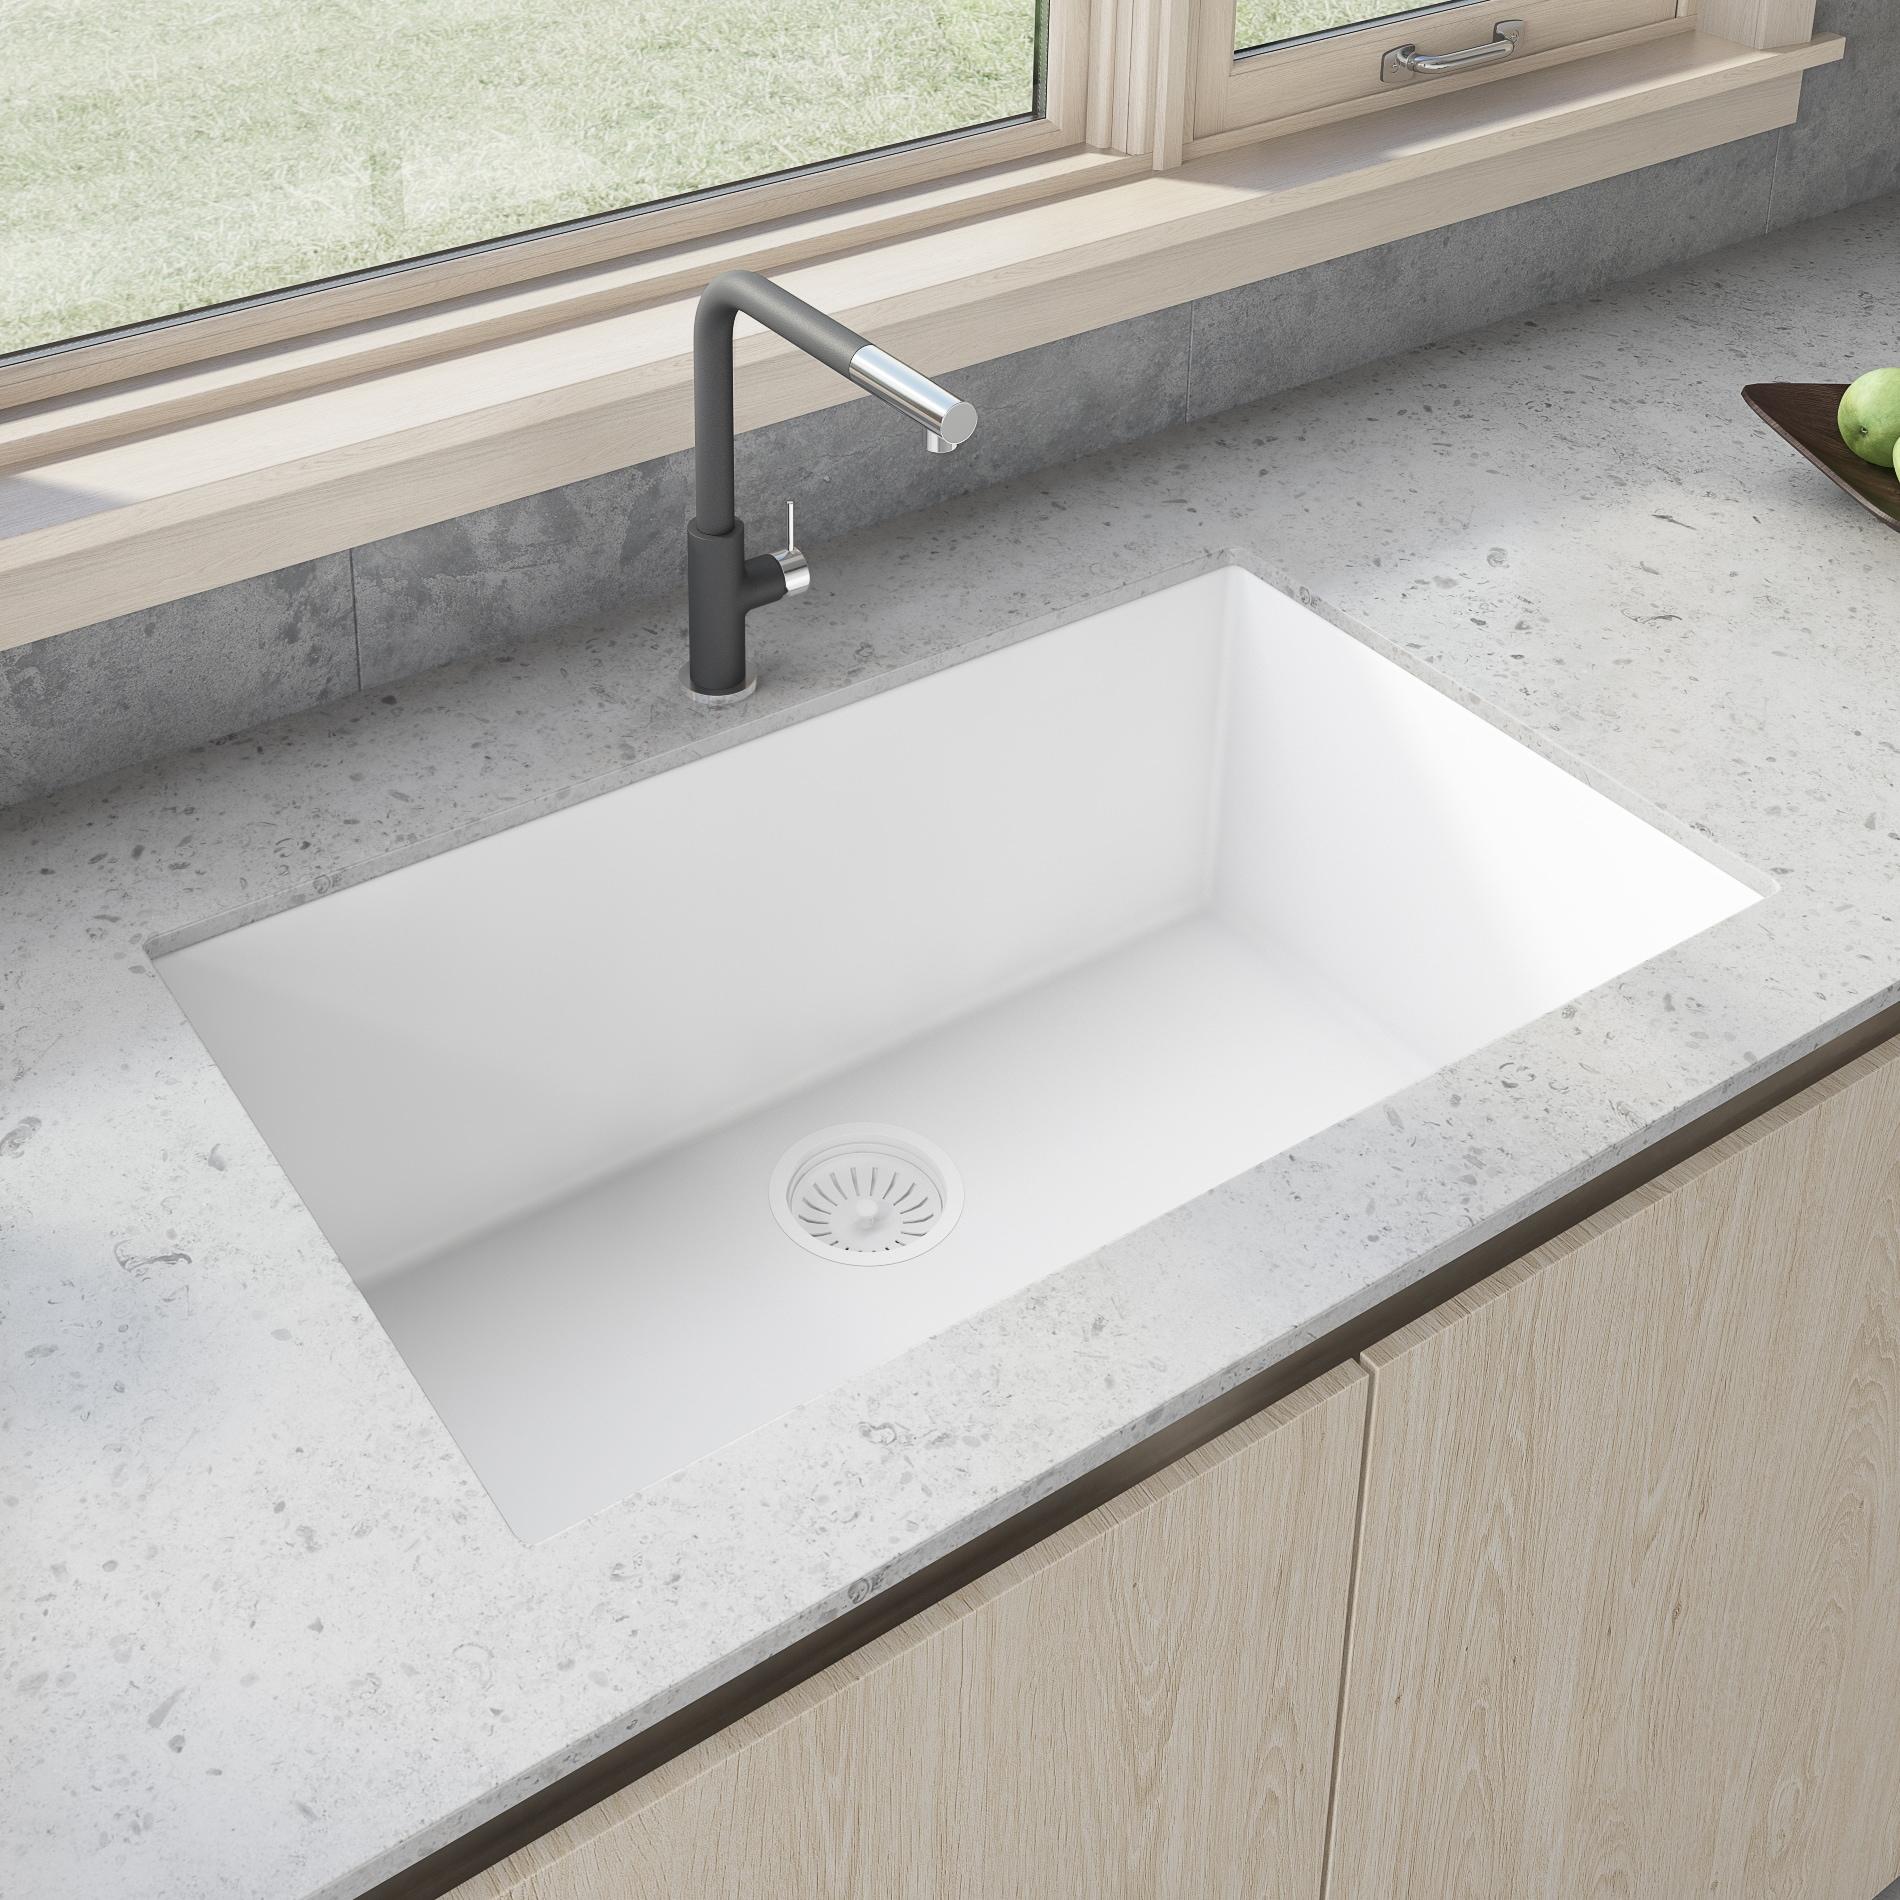 Shop Ruvati 33 x 19 inch Granite Composite Undermount Single Bowl